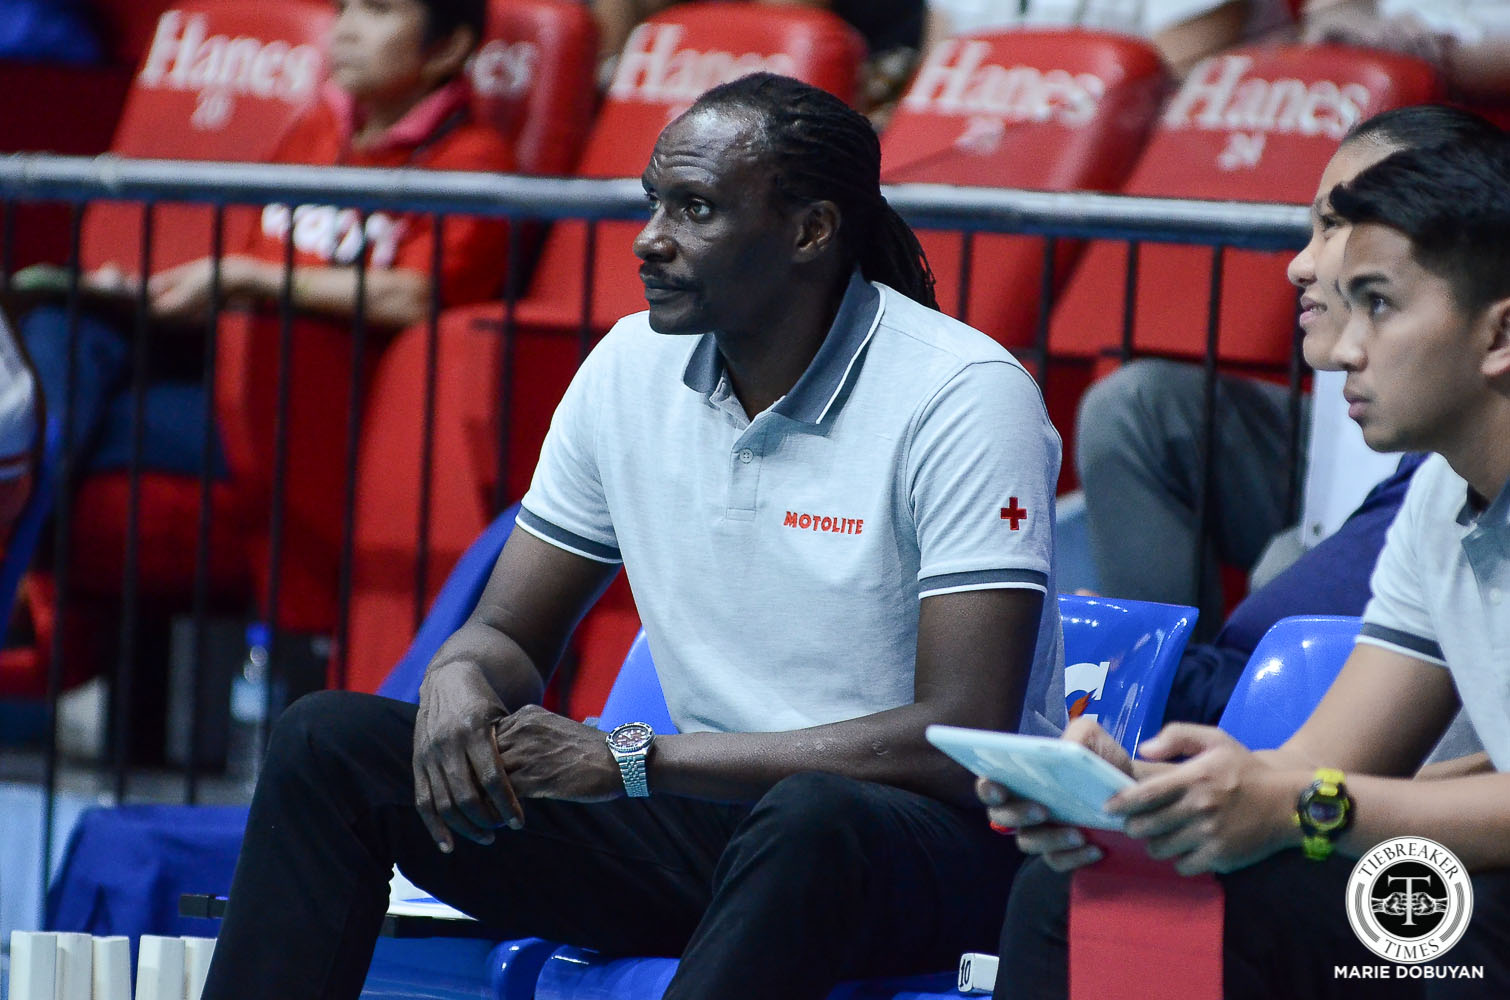 Tiebreaker Times Godfrey Okumu hopes Motolite can match Army's grit one day News PVL Volleyball  Pacific Town-Army Lady Troopers Motolite Godfrey Okumu 2019 PVL Season 2019 PVL Open Conference